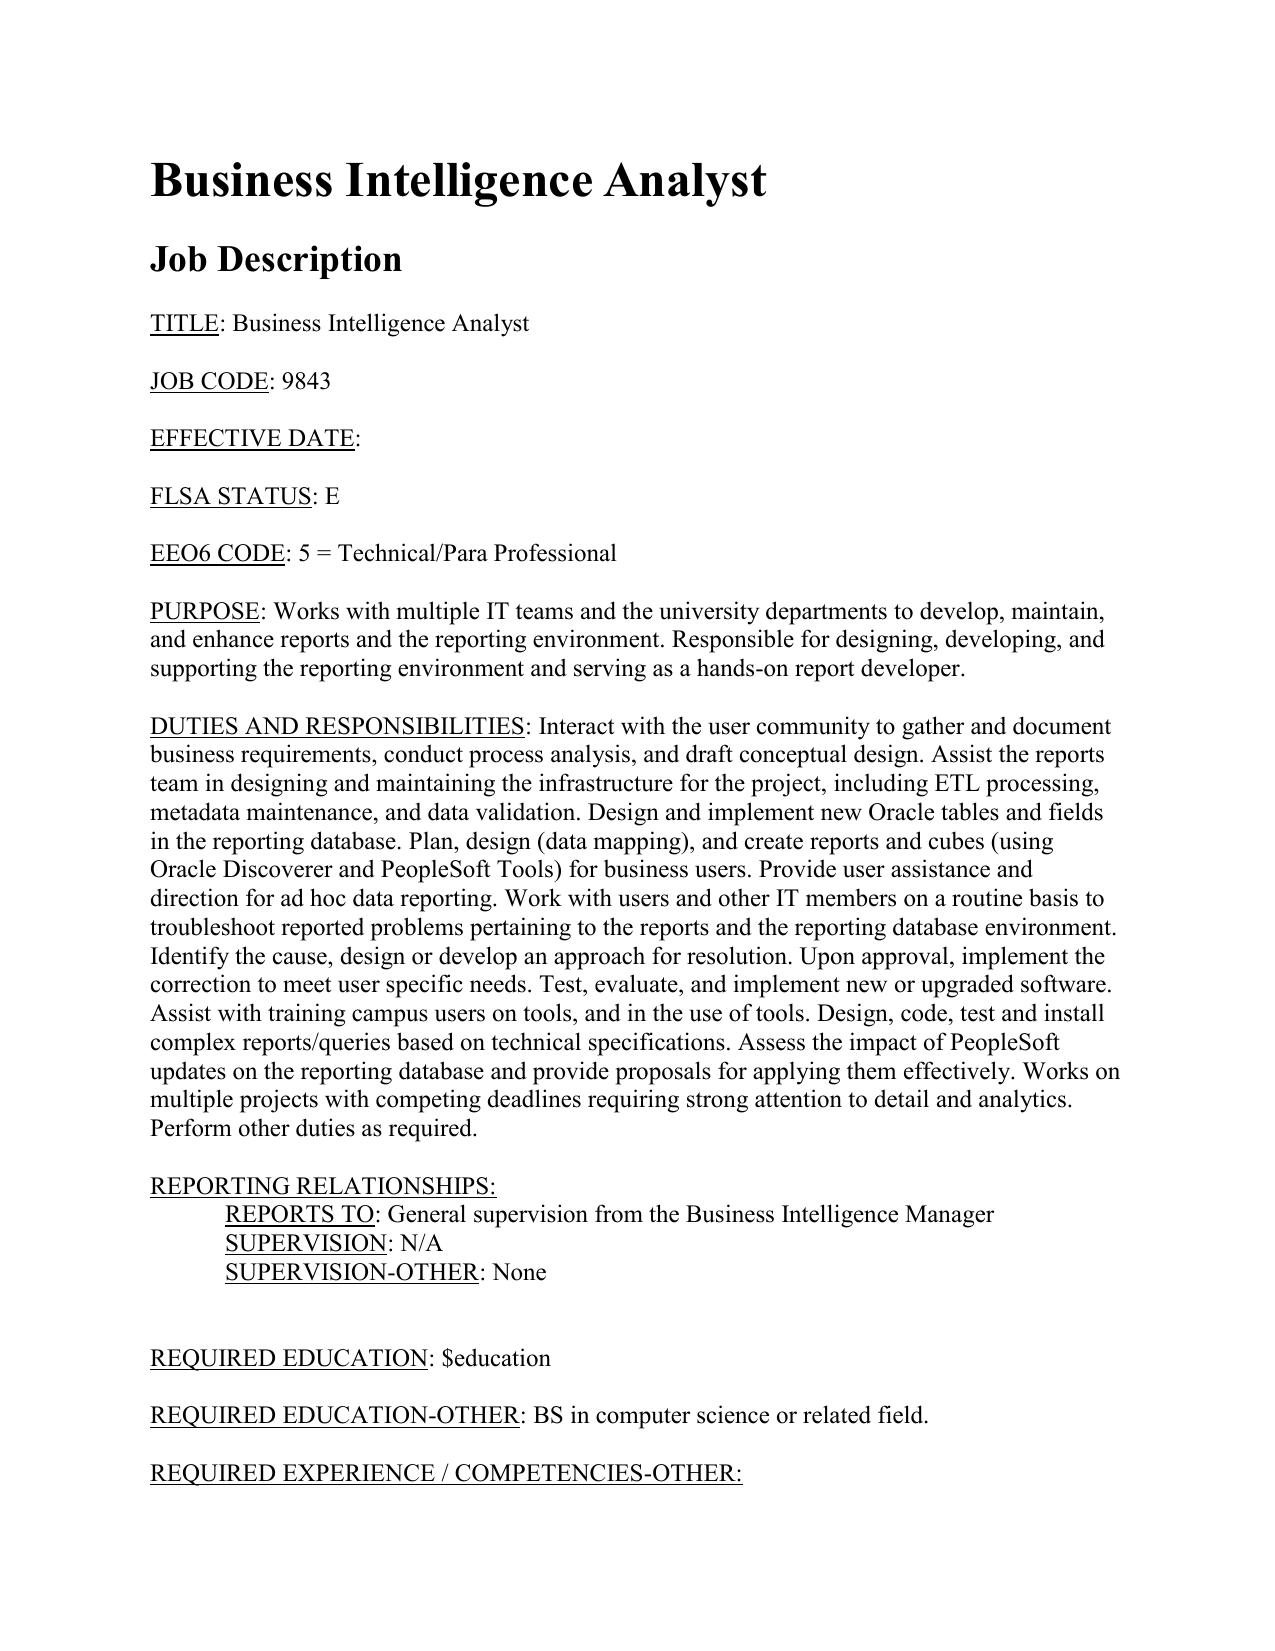 reporting analyst job description